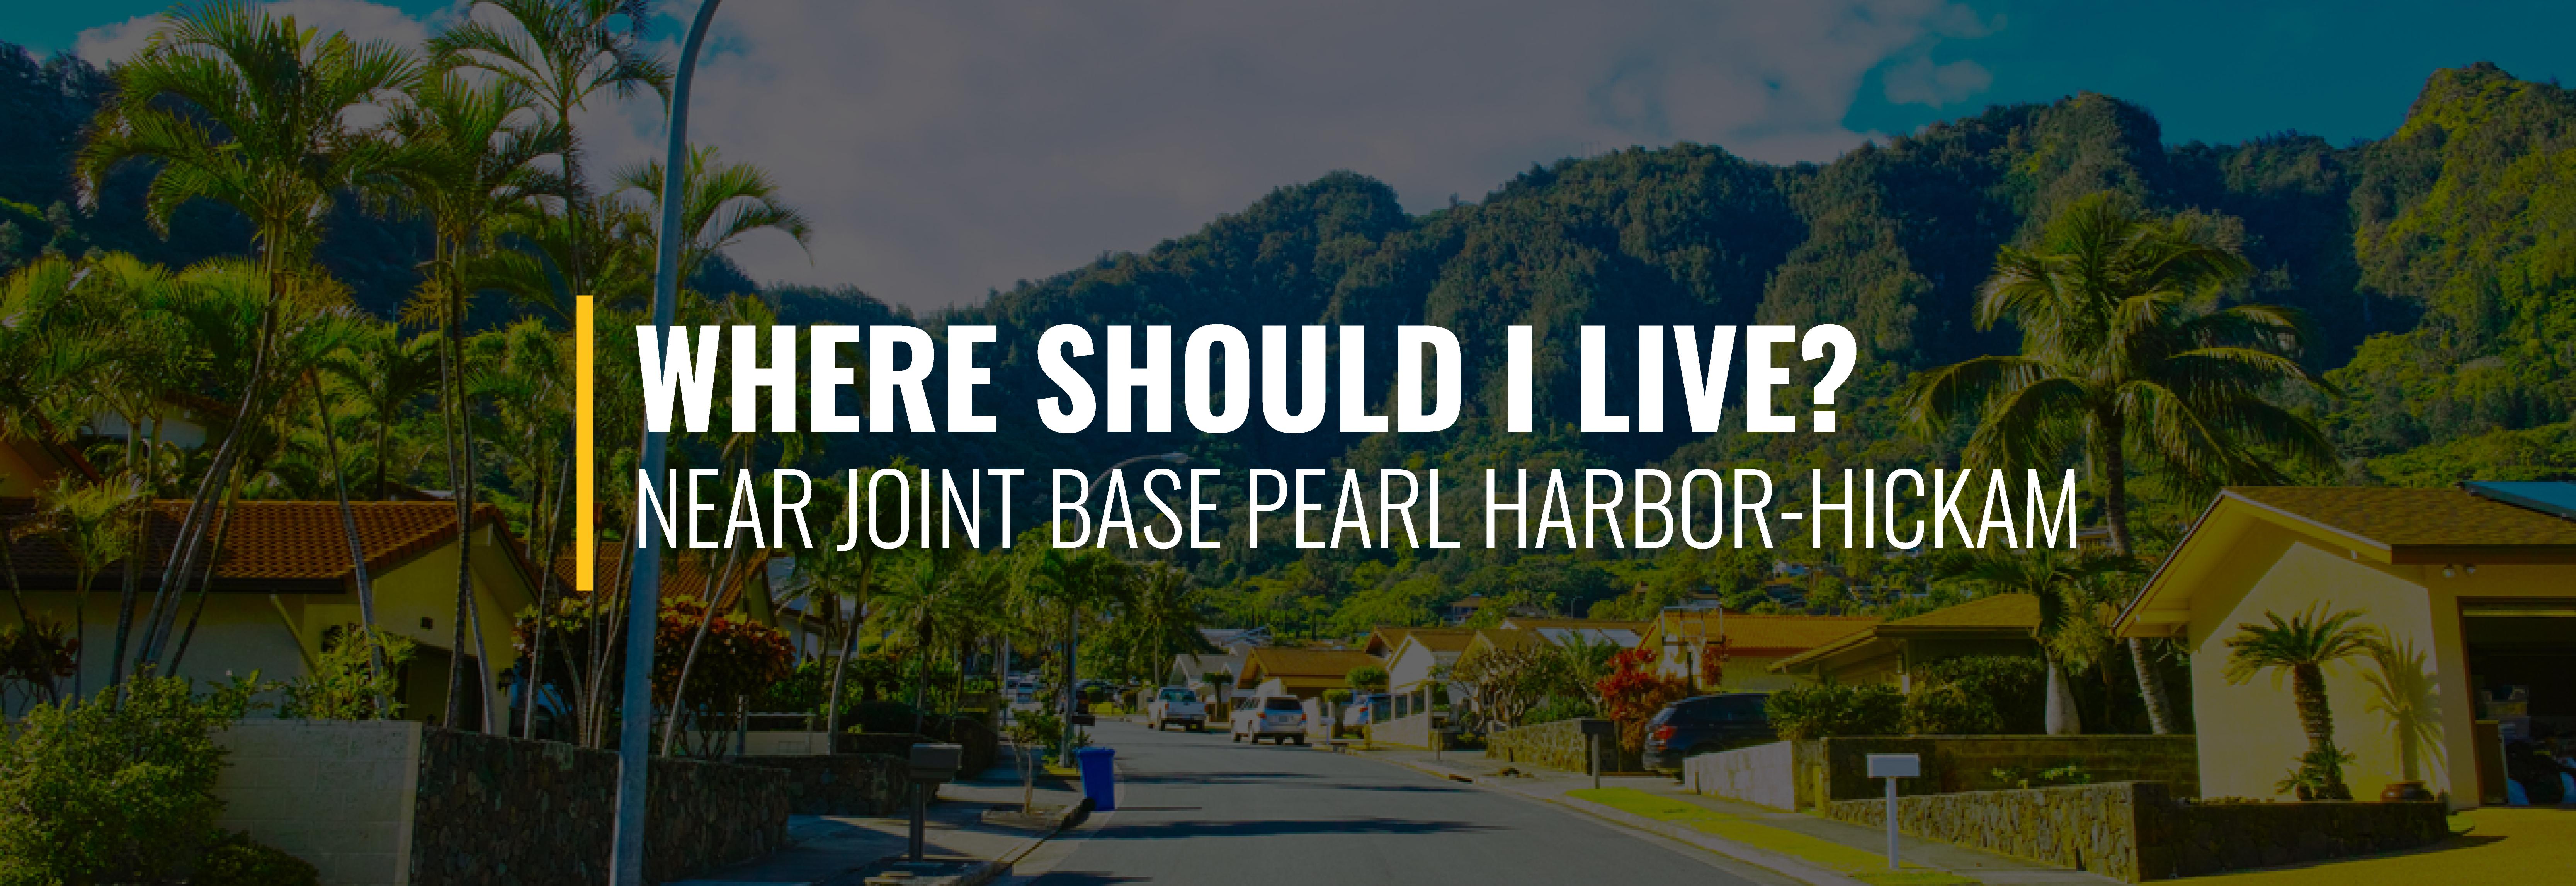 Where Should I Live Near Joint Base Pearl Harbor-Hickam?